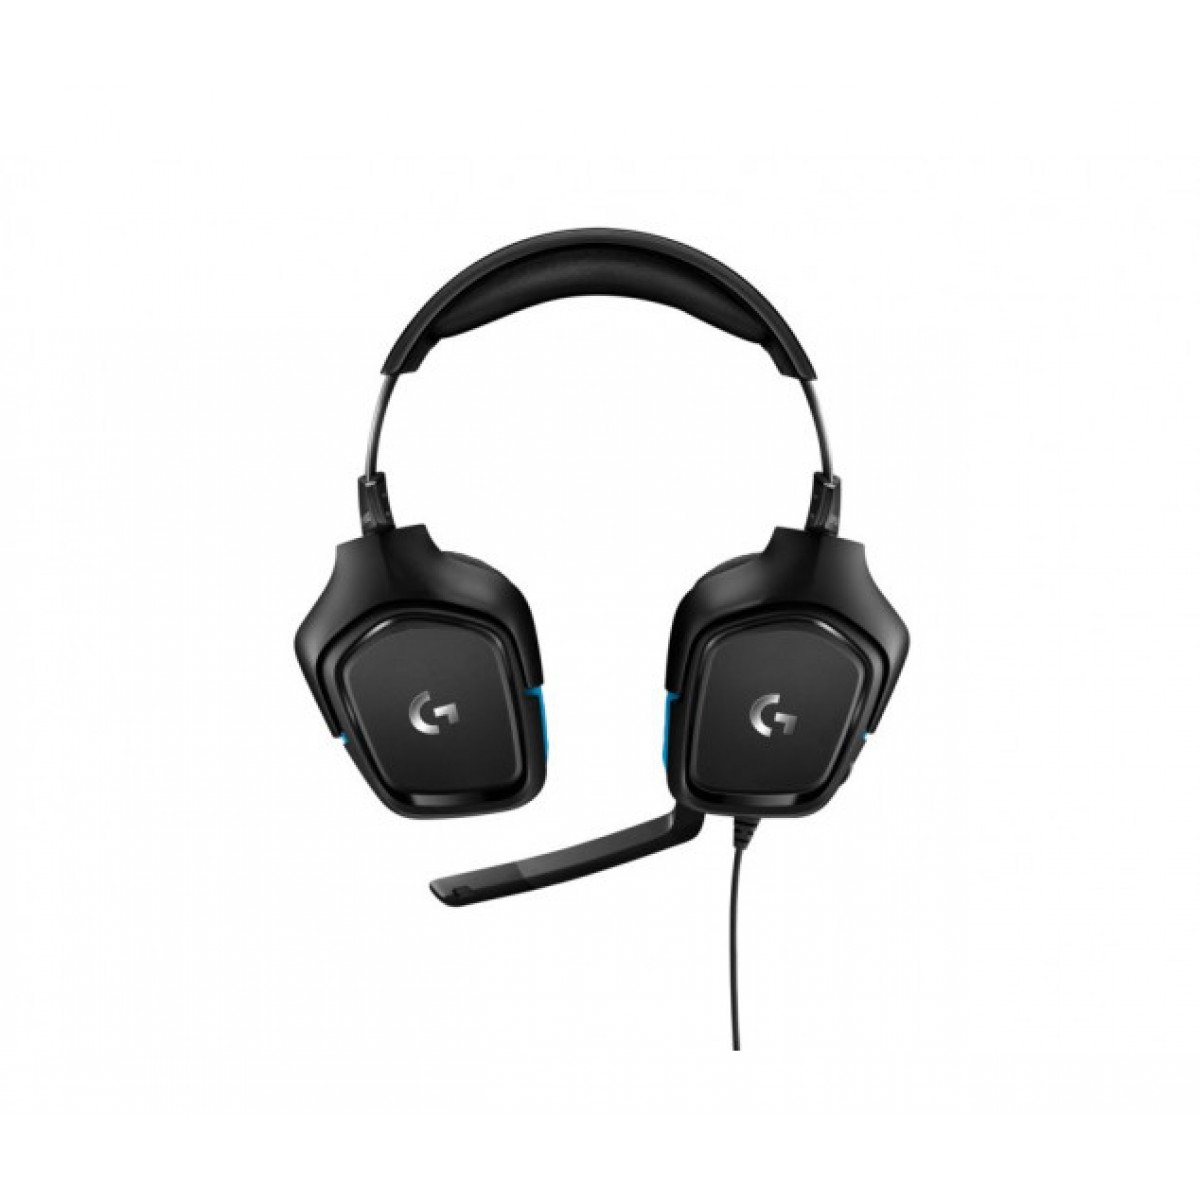 Headset Gamer Logitech G432, 7.1 Surround, Black/Blue, 981-000769